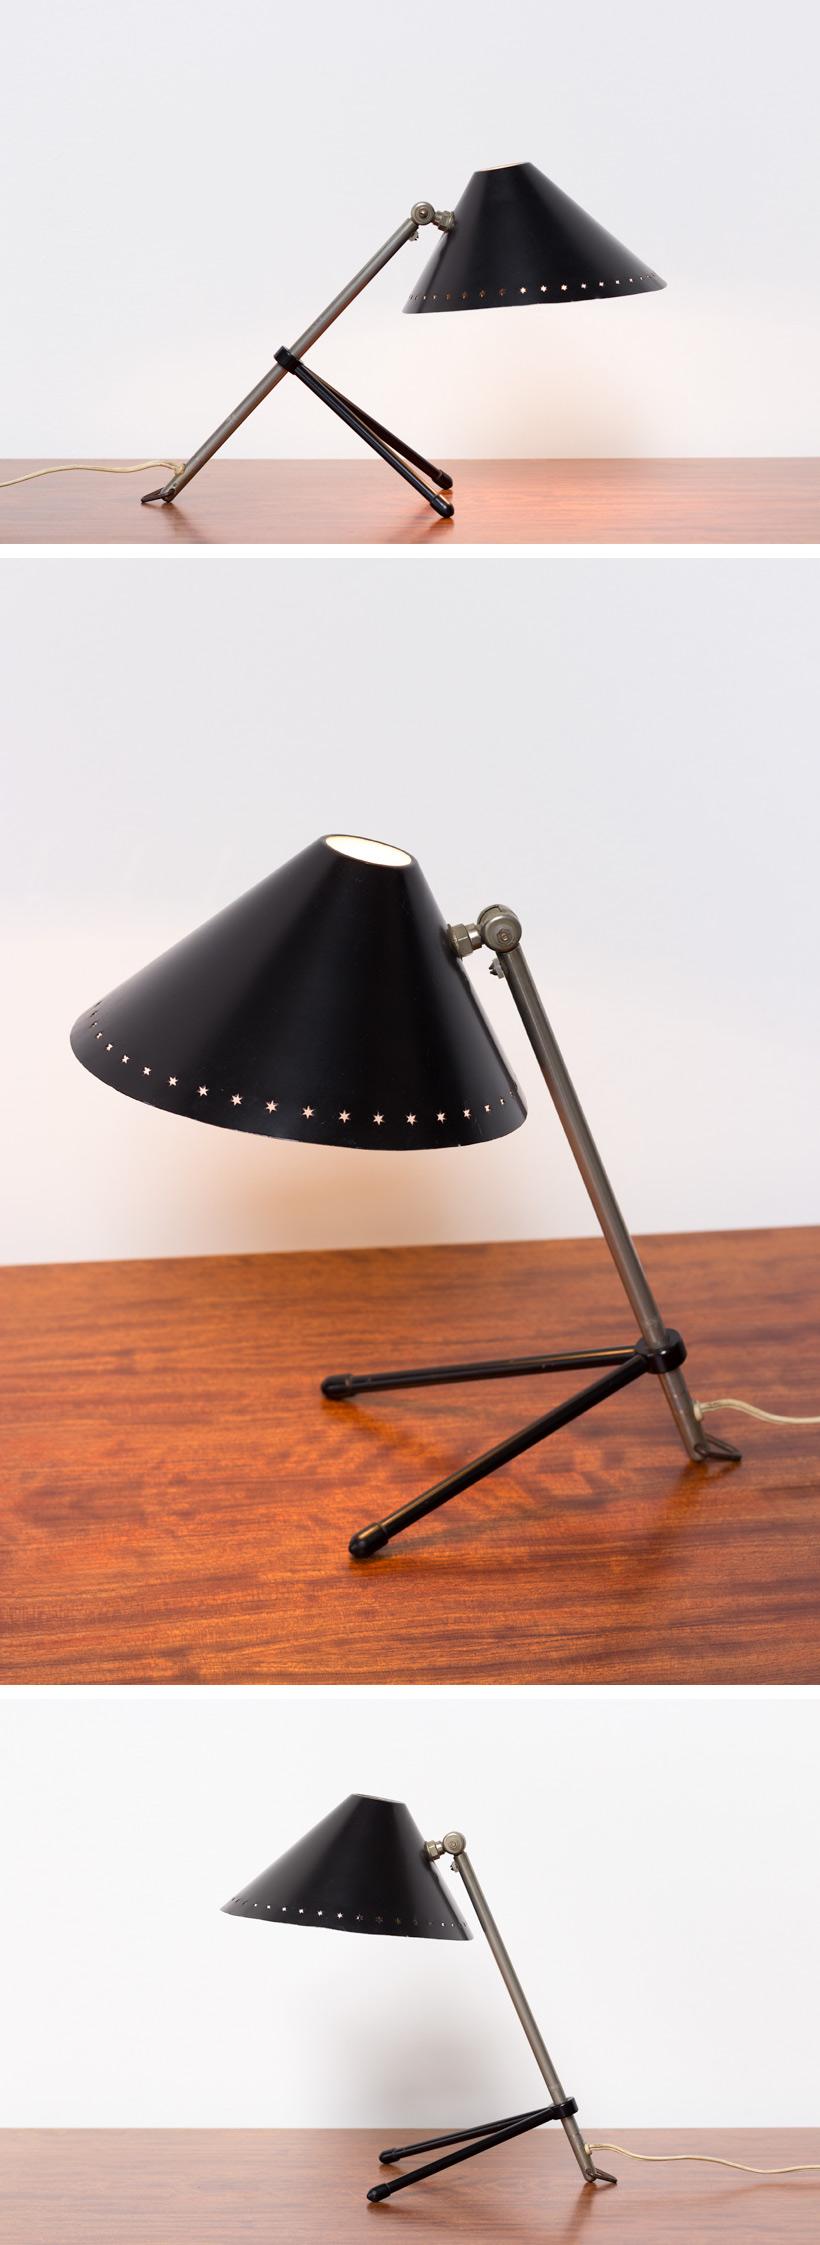 H Busquet black Pinocchio lamp Large